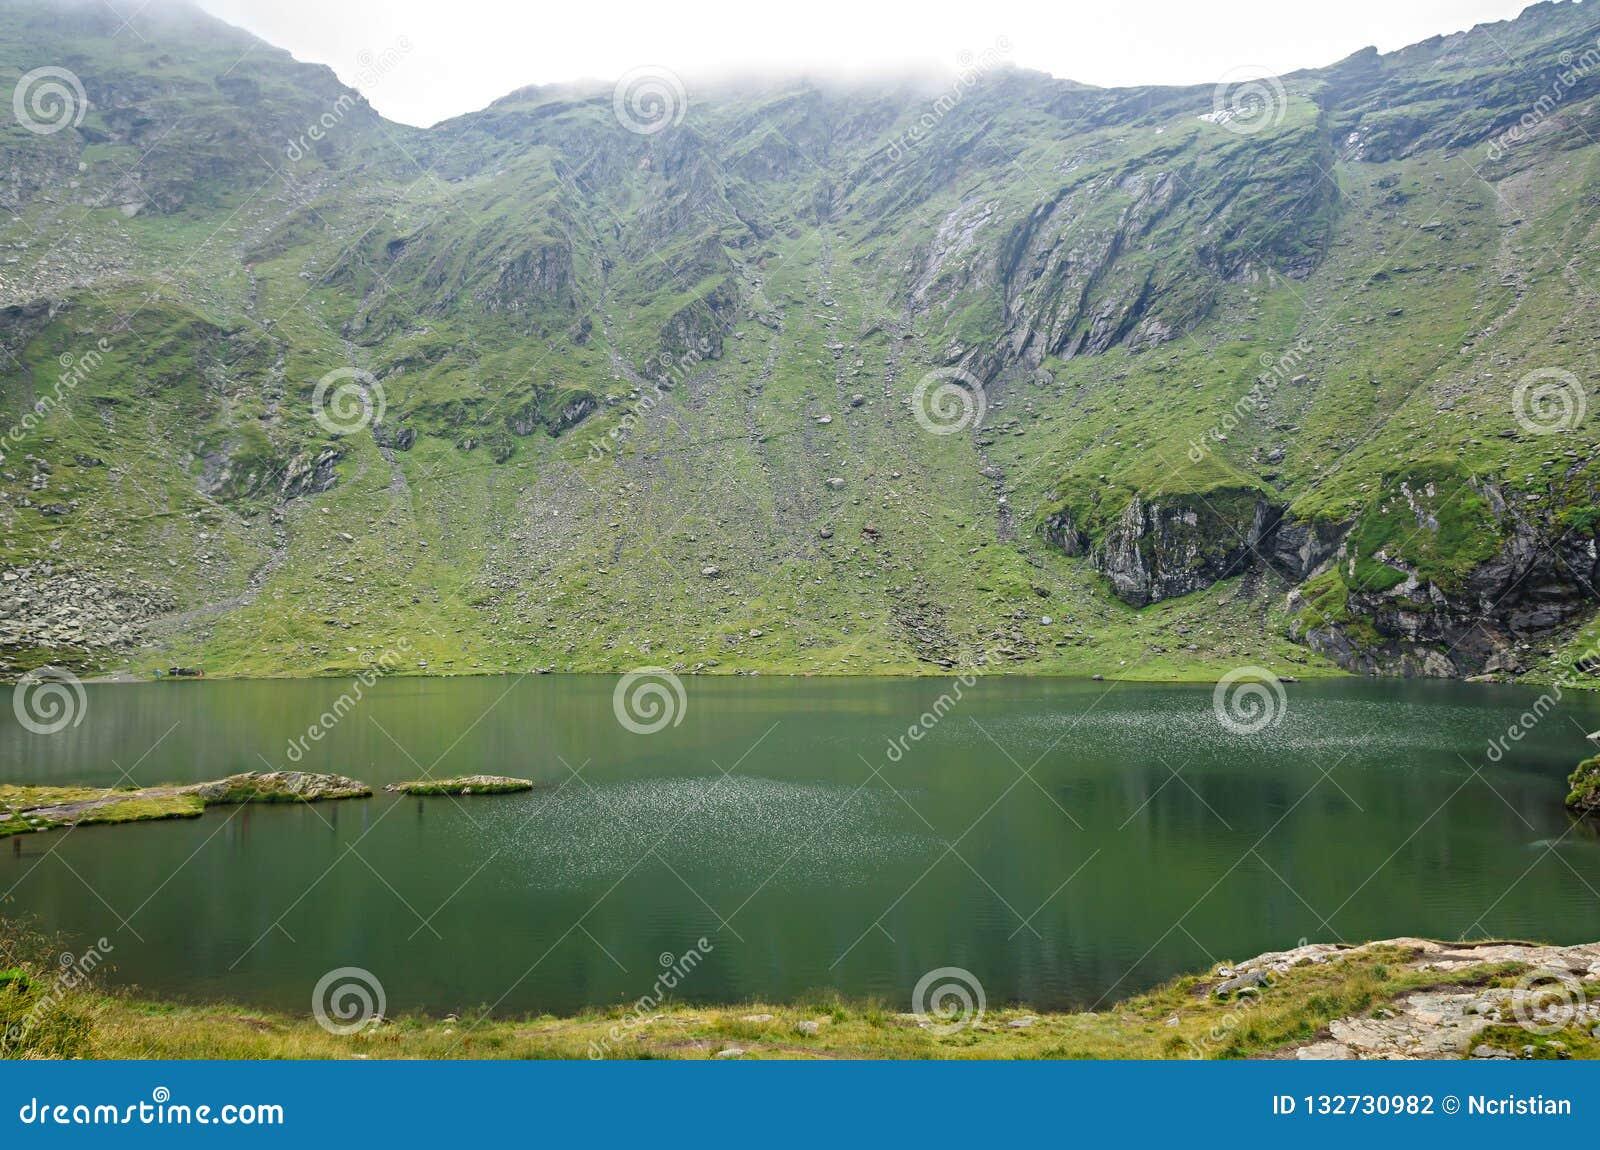 The glacier lake called Balea Balea Lac on the Transfagarasan